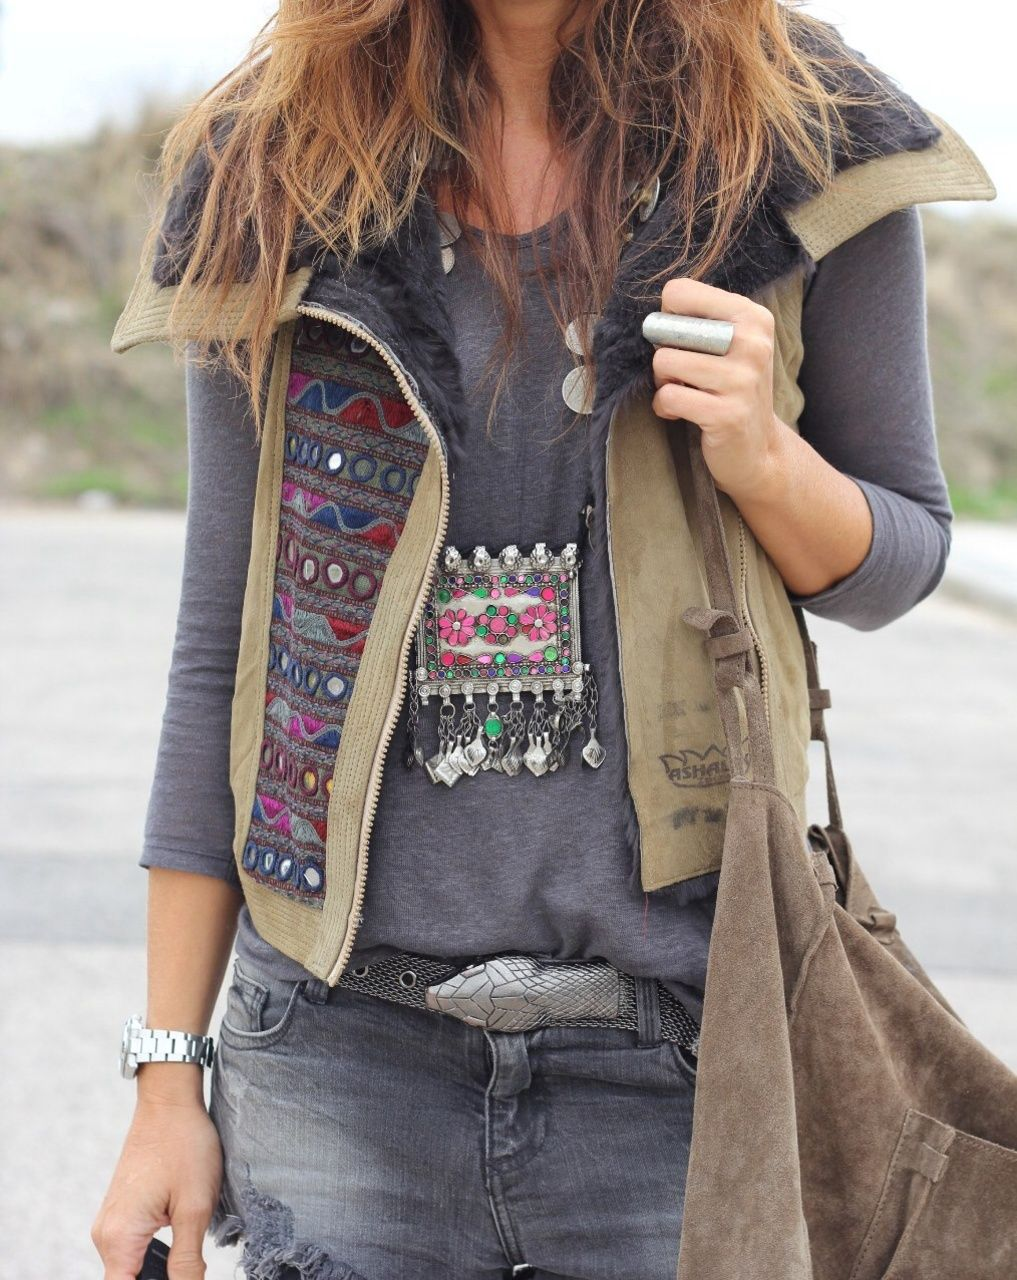 Boho Chic Ethnic Inspiration In Interior Design Projects: Fashion, Boho Fashion, Hippie